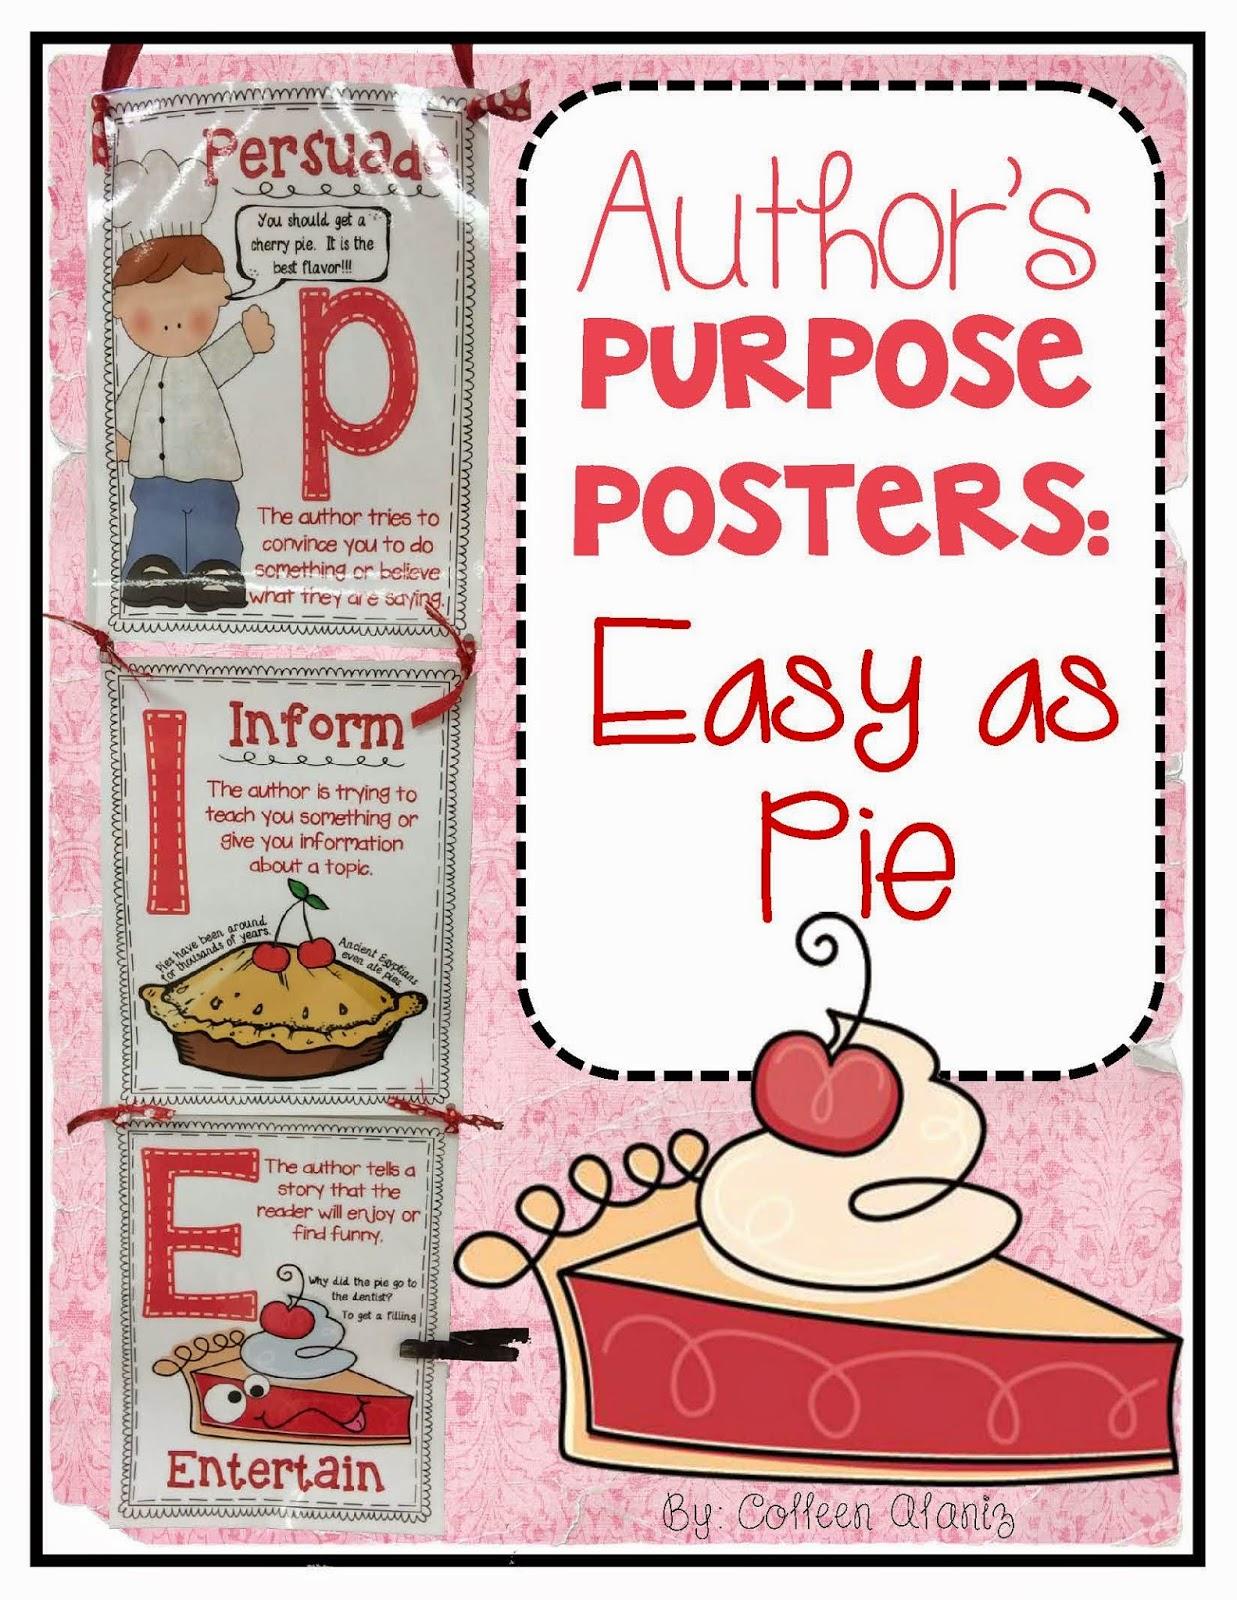 http://www.teacherspayteachers.com/Product/Authors-Purpose-Easy-as-PIE-1319169